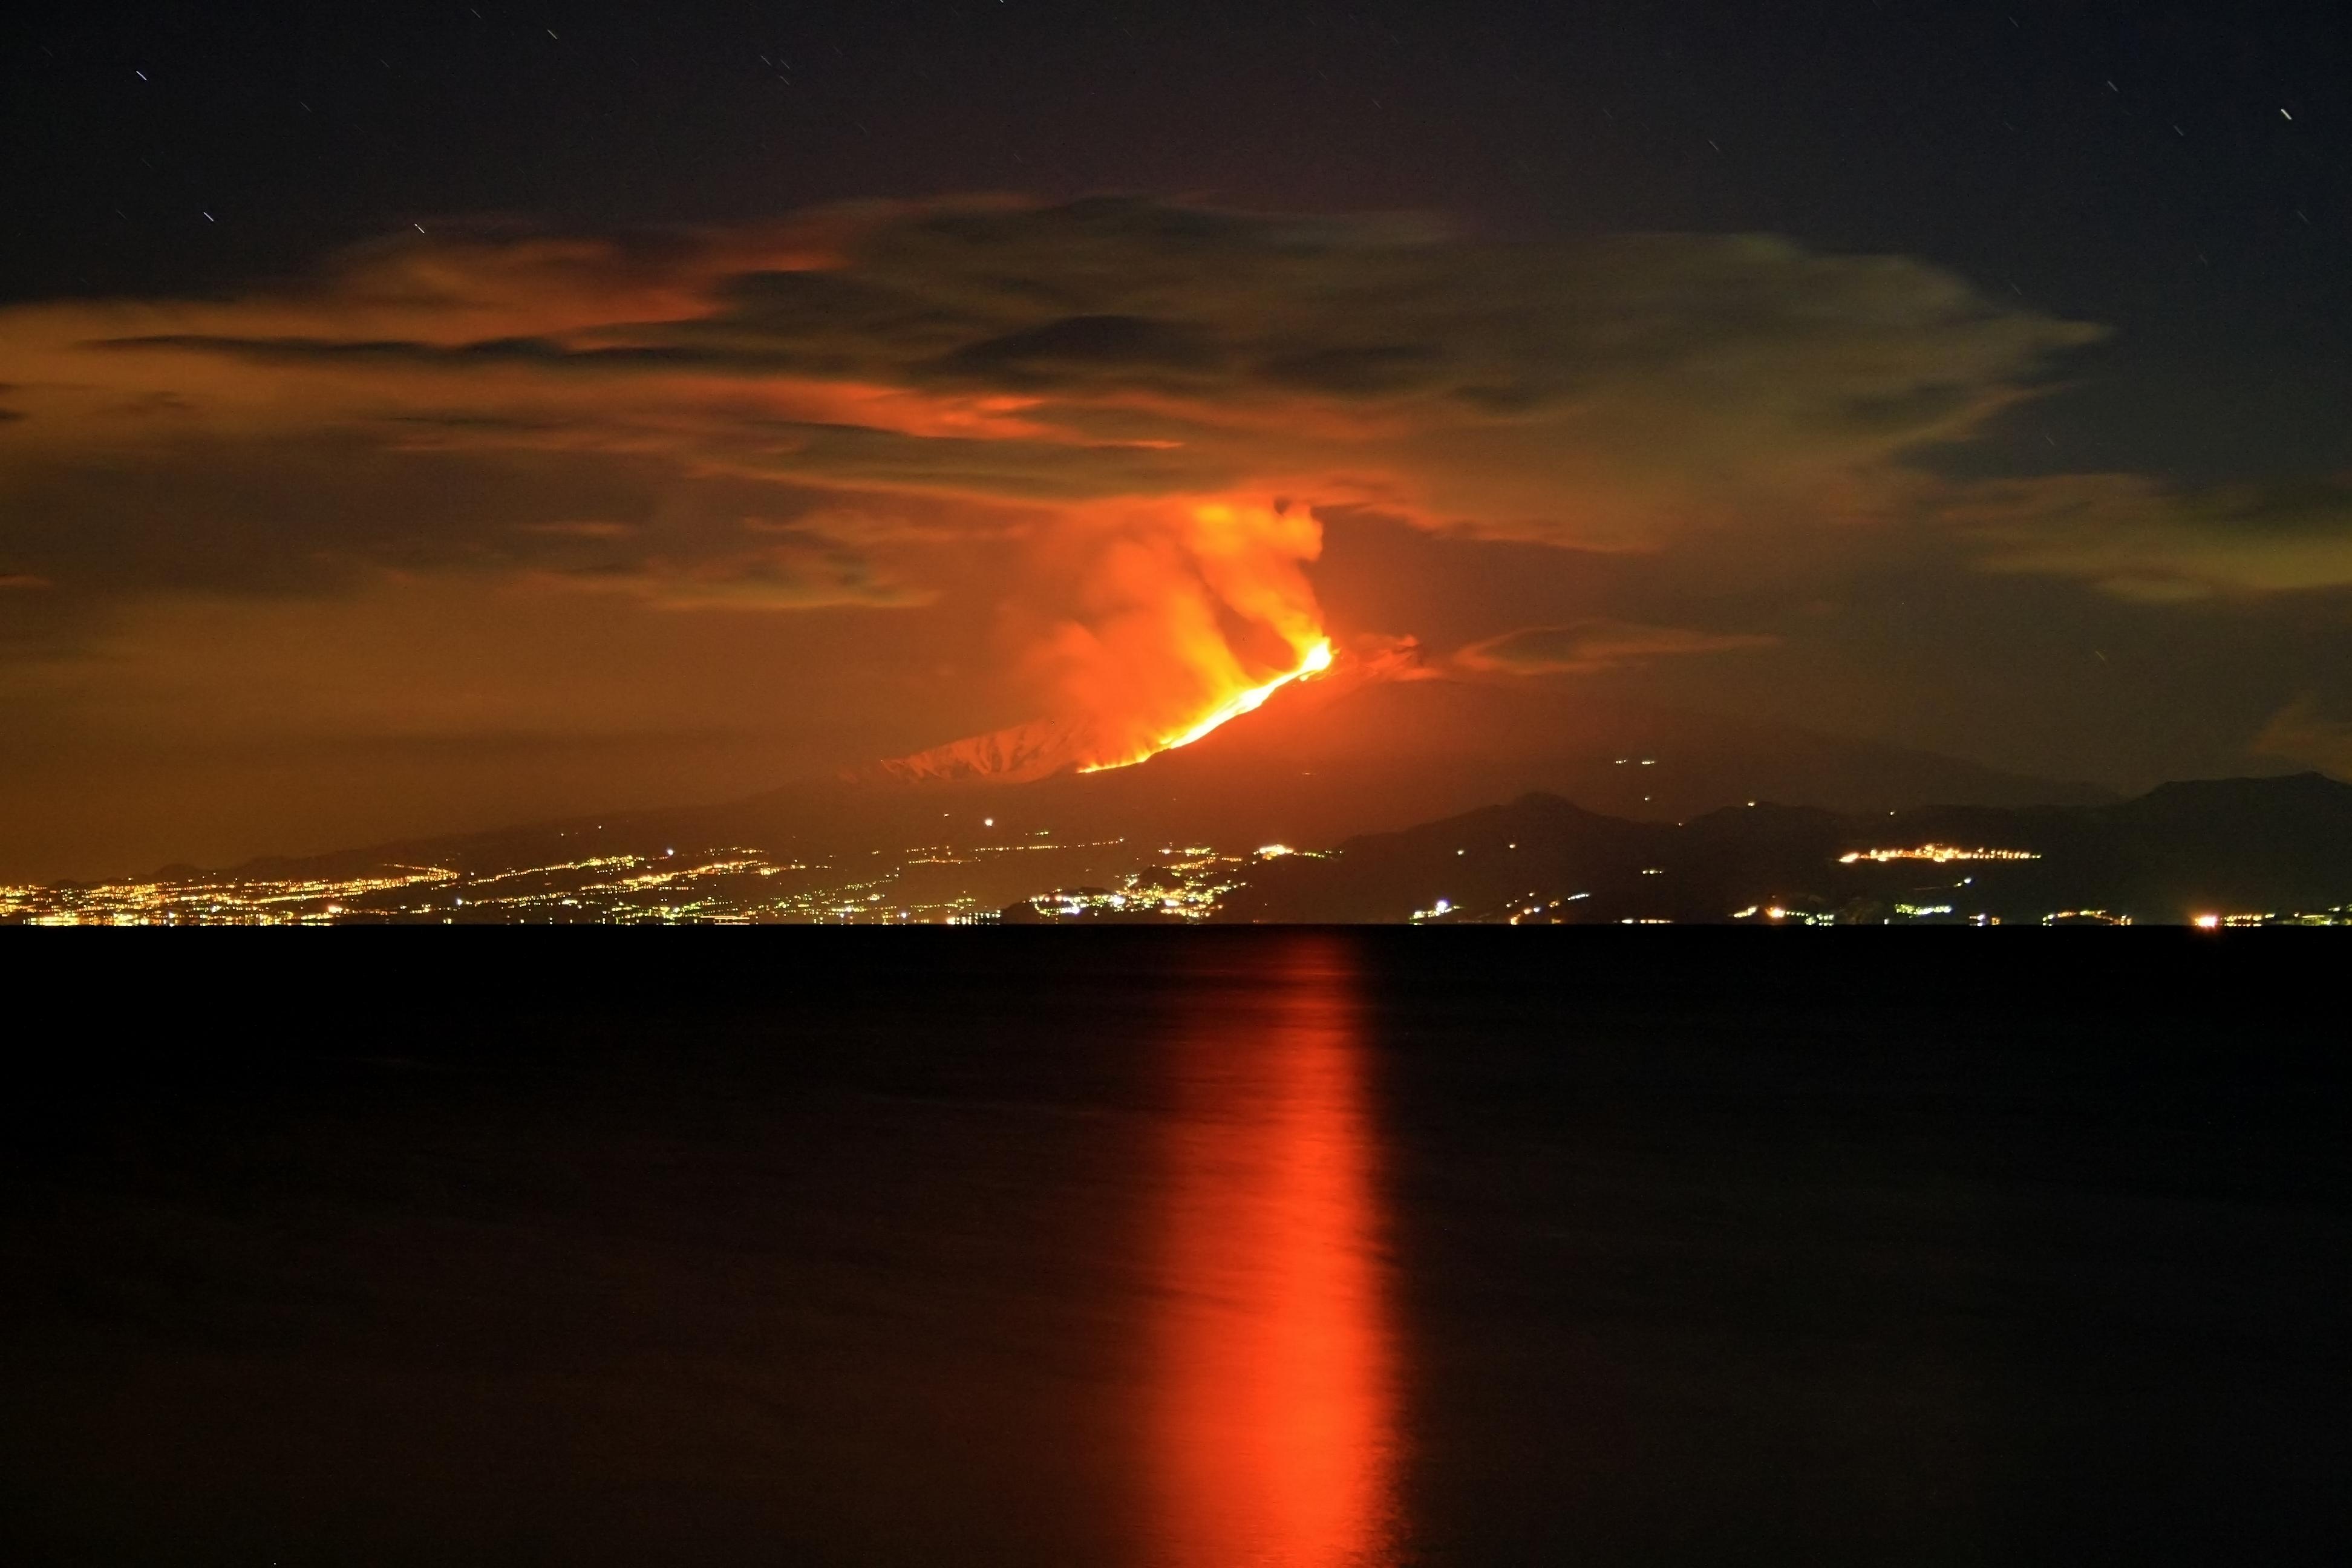 File:Eruzione Etna 13-01-2011 C.jpg - Wikimedia Commons